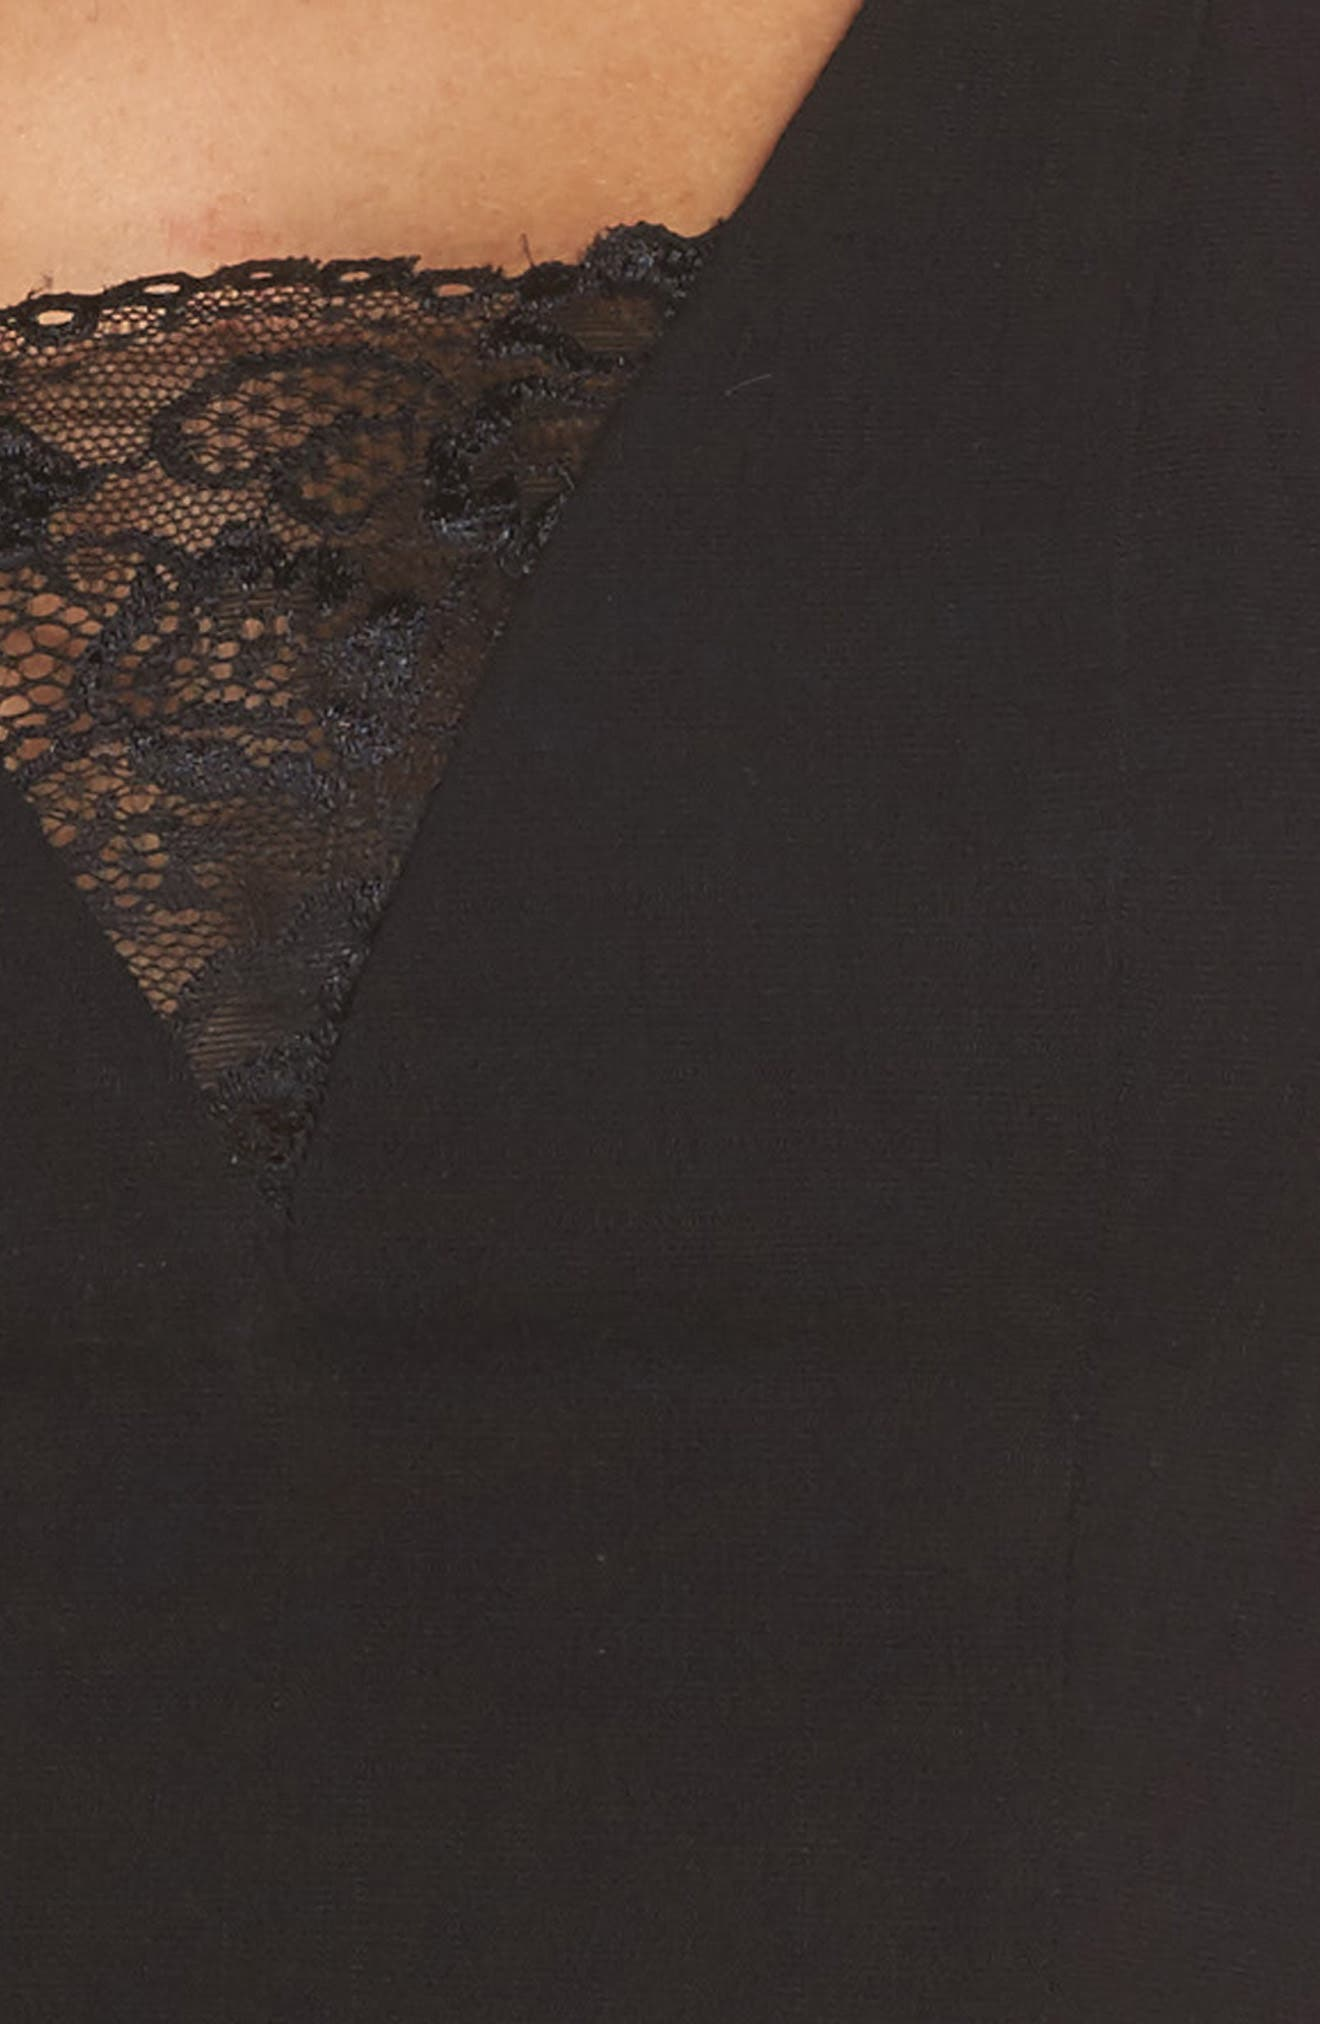 Intimately FP The Century Brami Longline Bralette,                             Alternate thumbnail 4, color,                             001